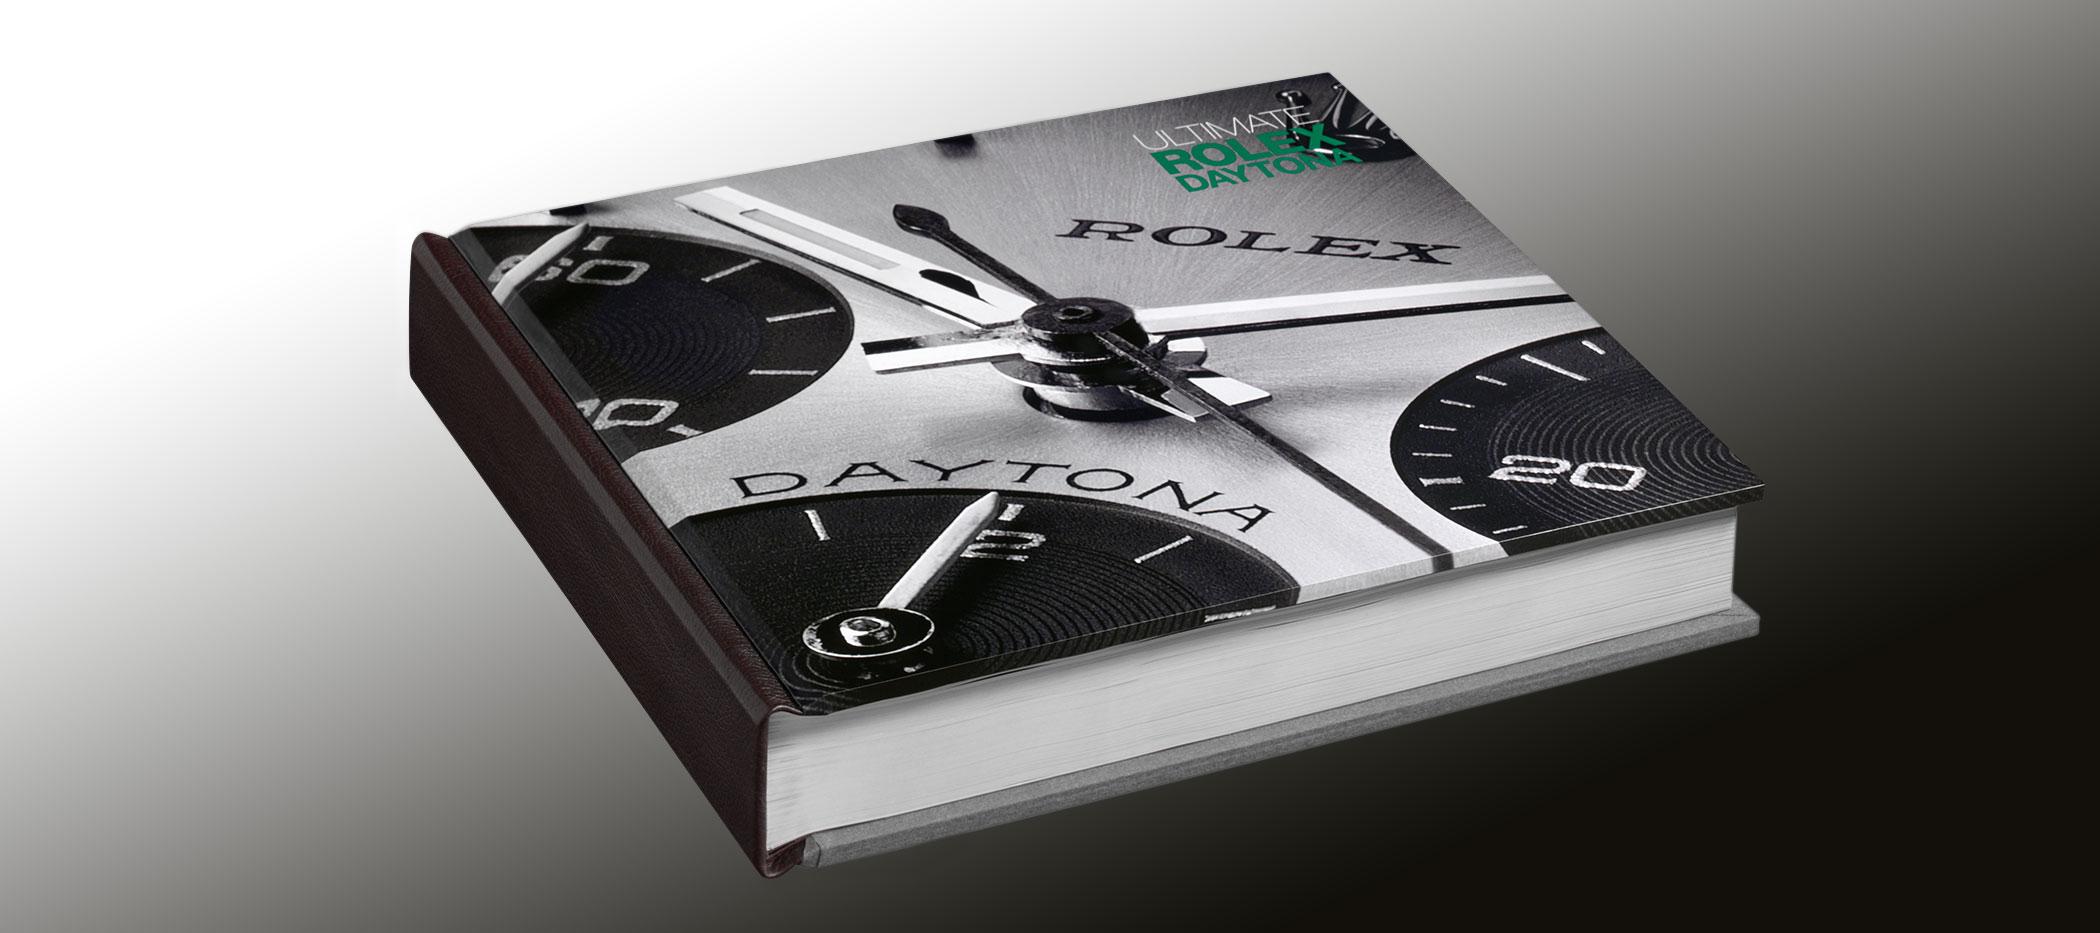 The Ultimate Rolex Daytona Book